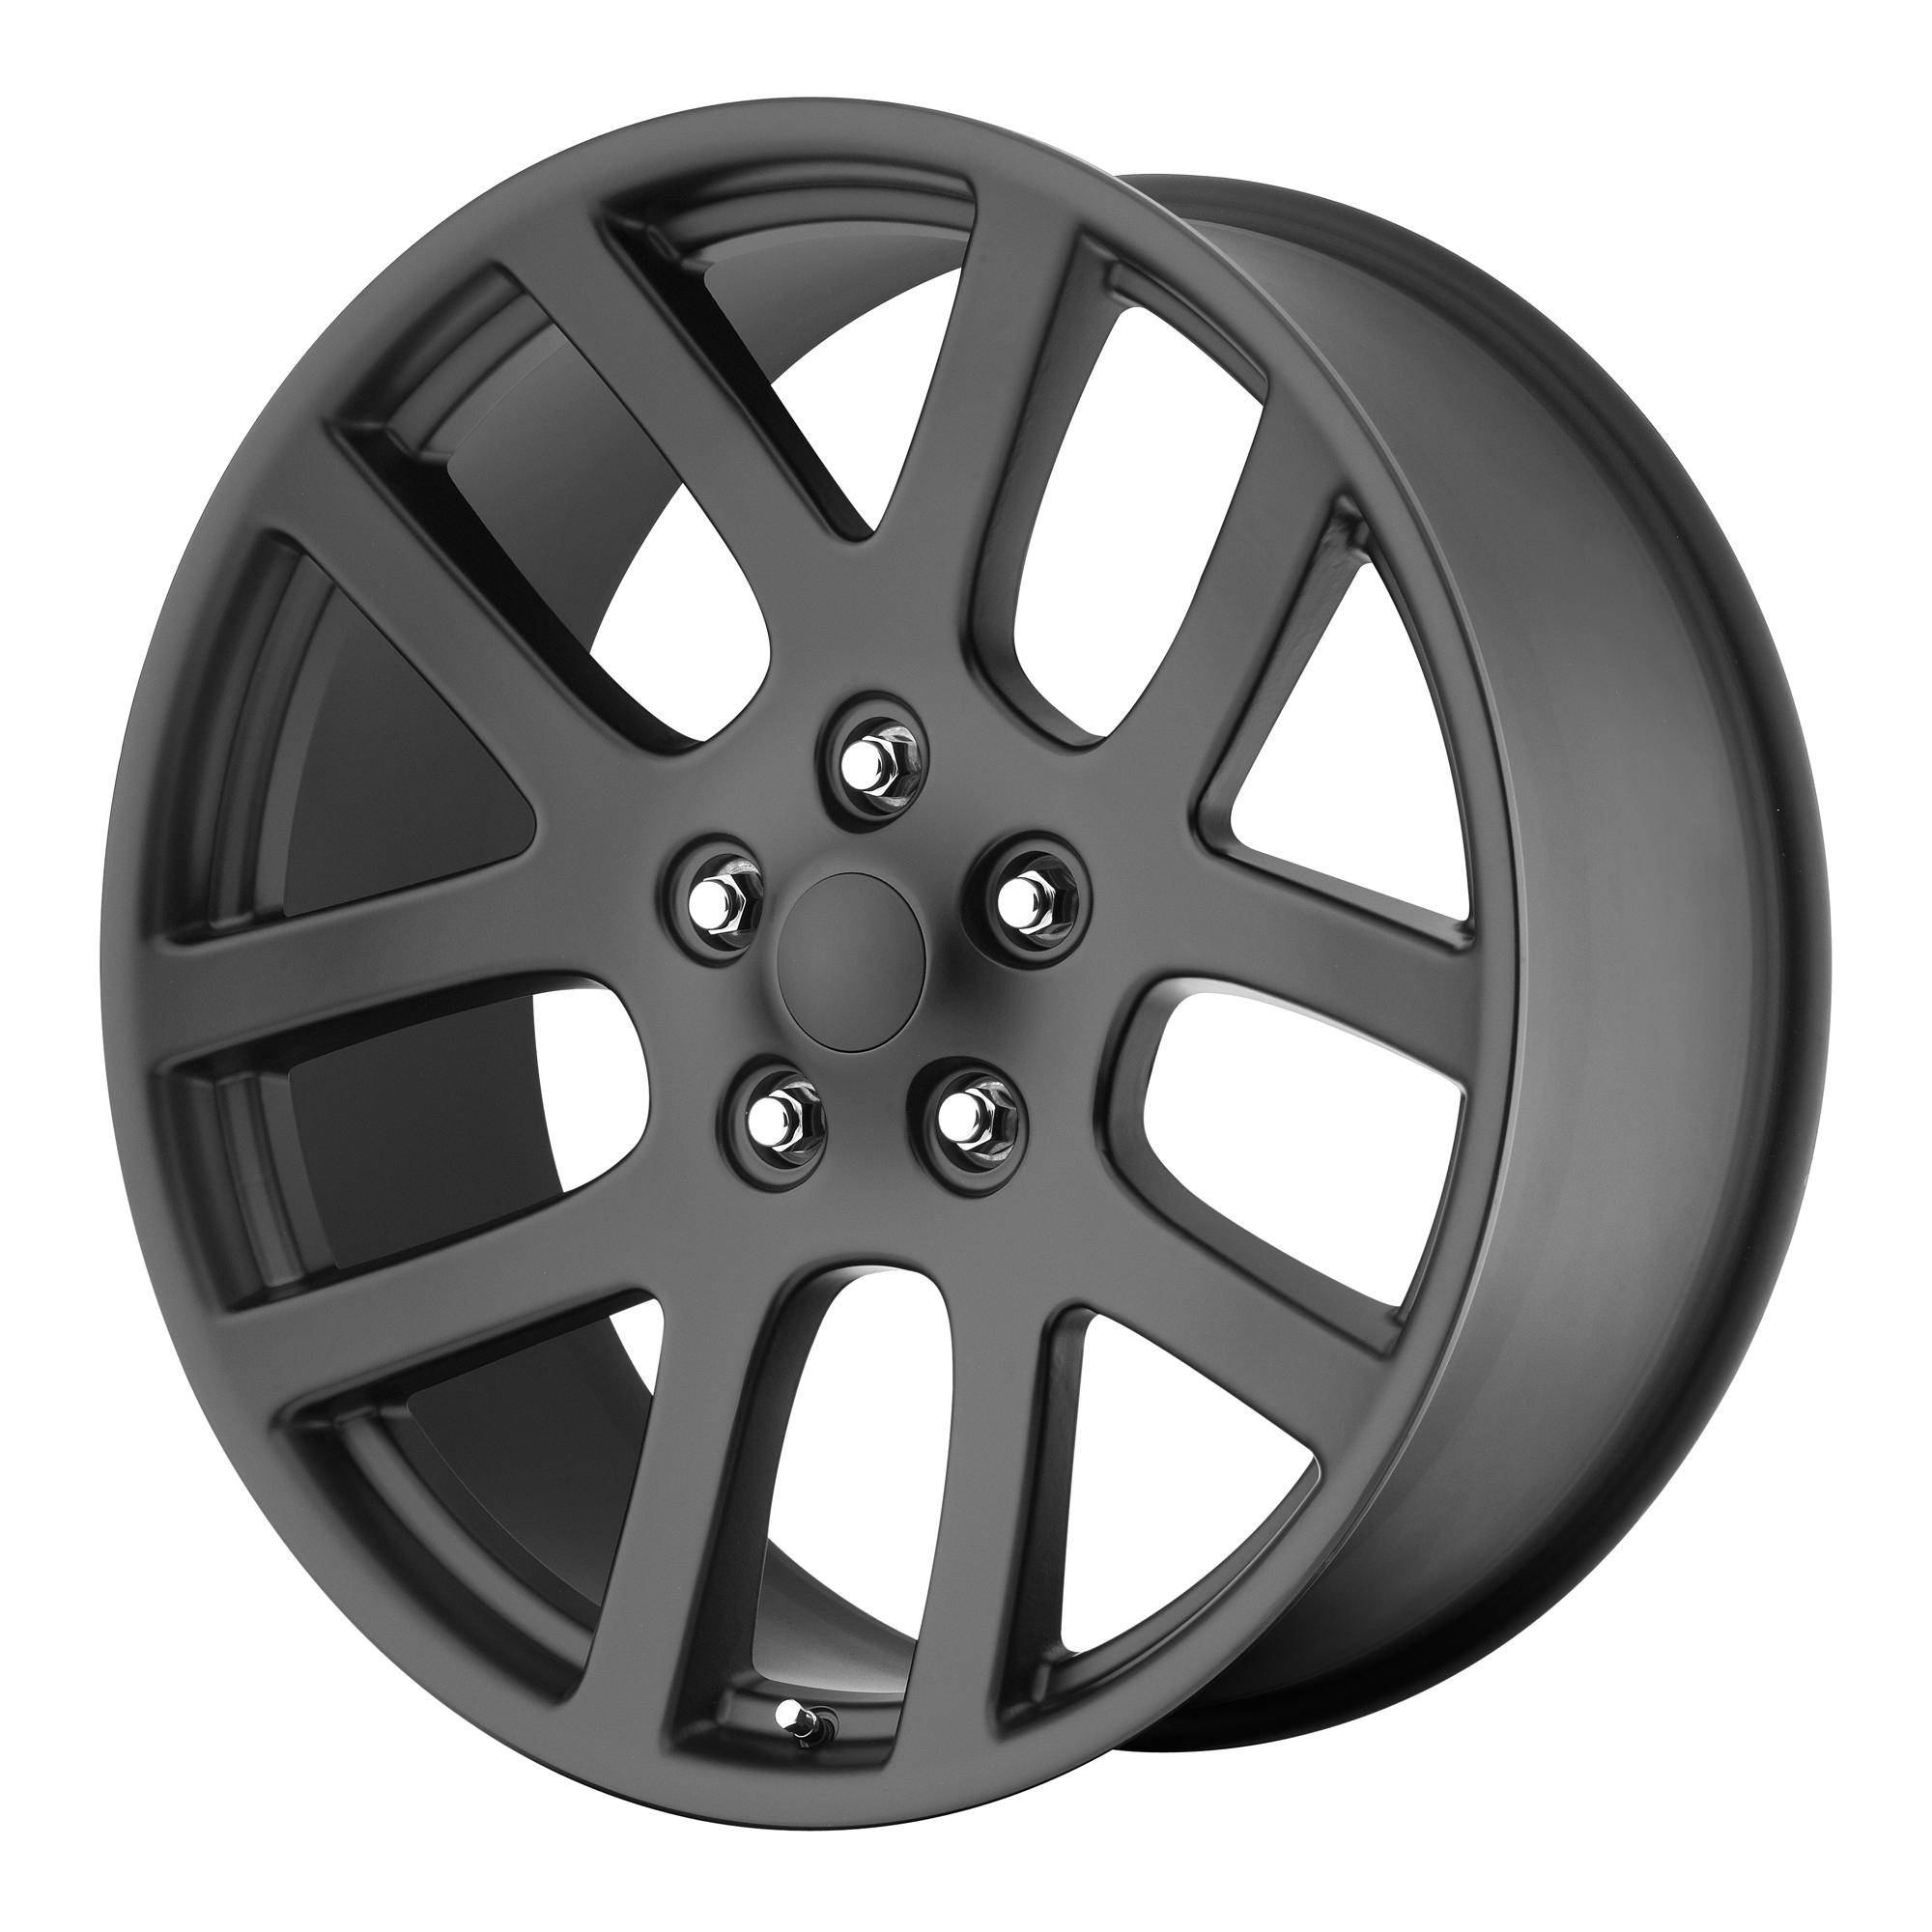 OE Creations Replica Wheels OE Creations 107C Matte Black